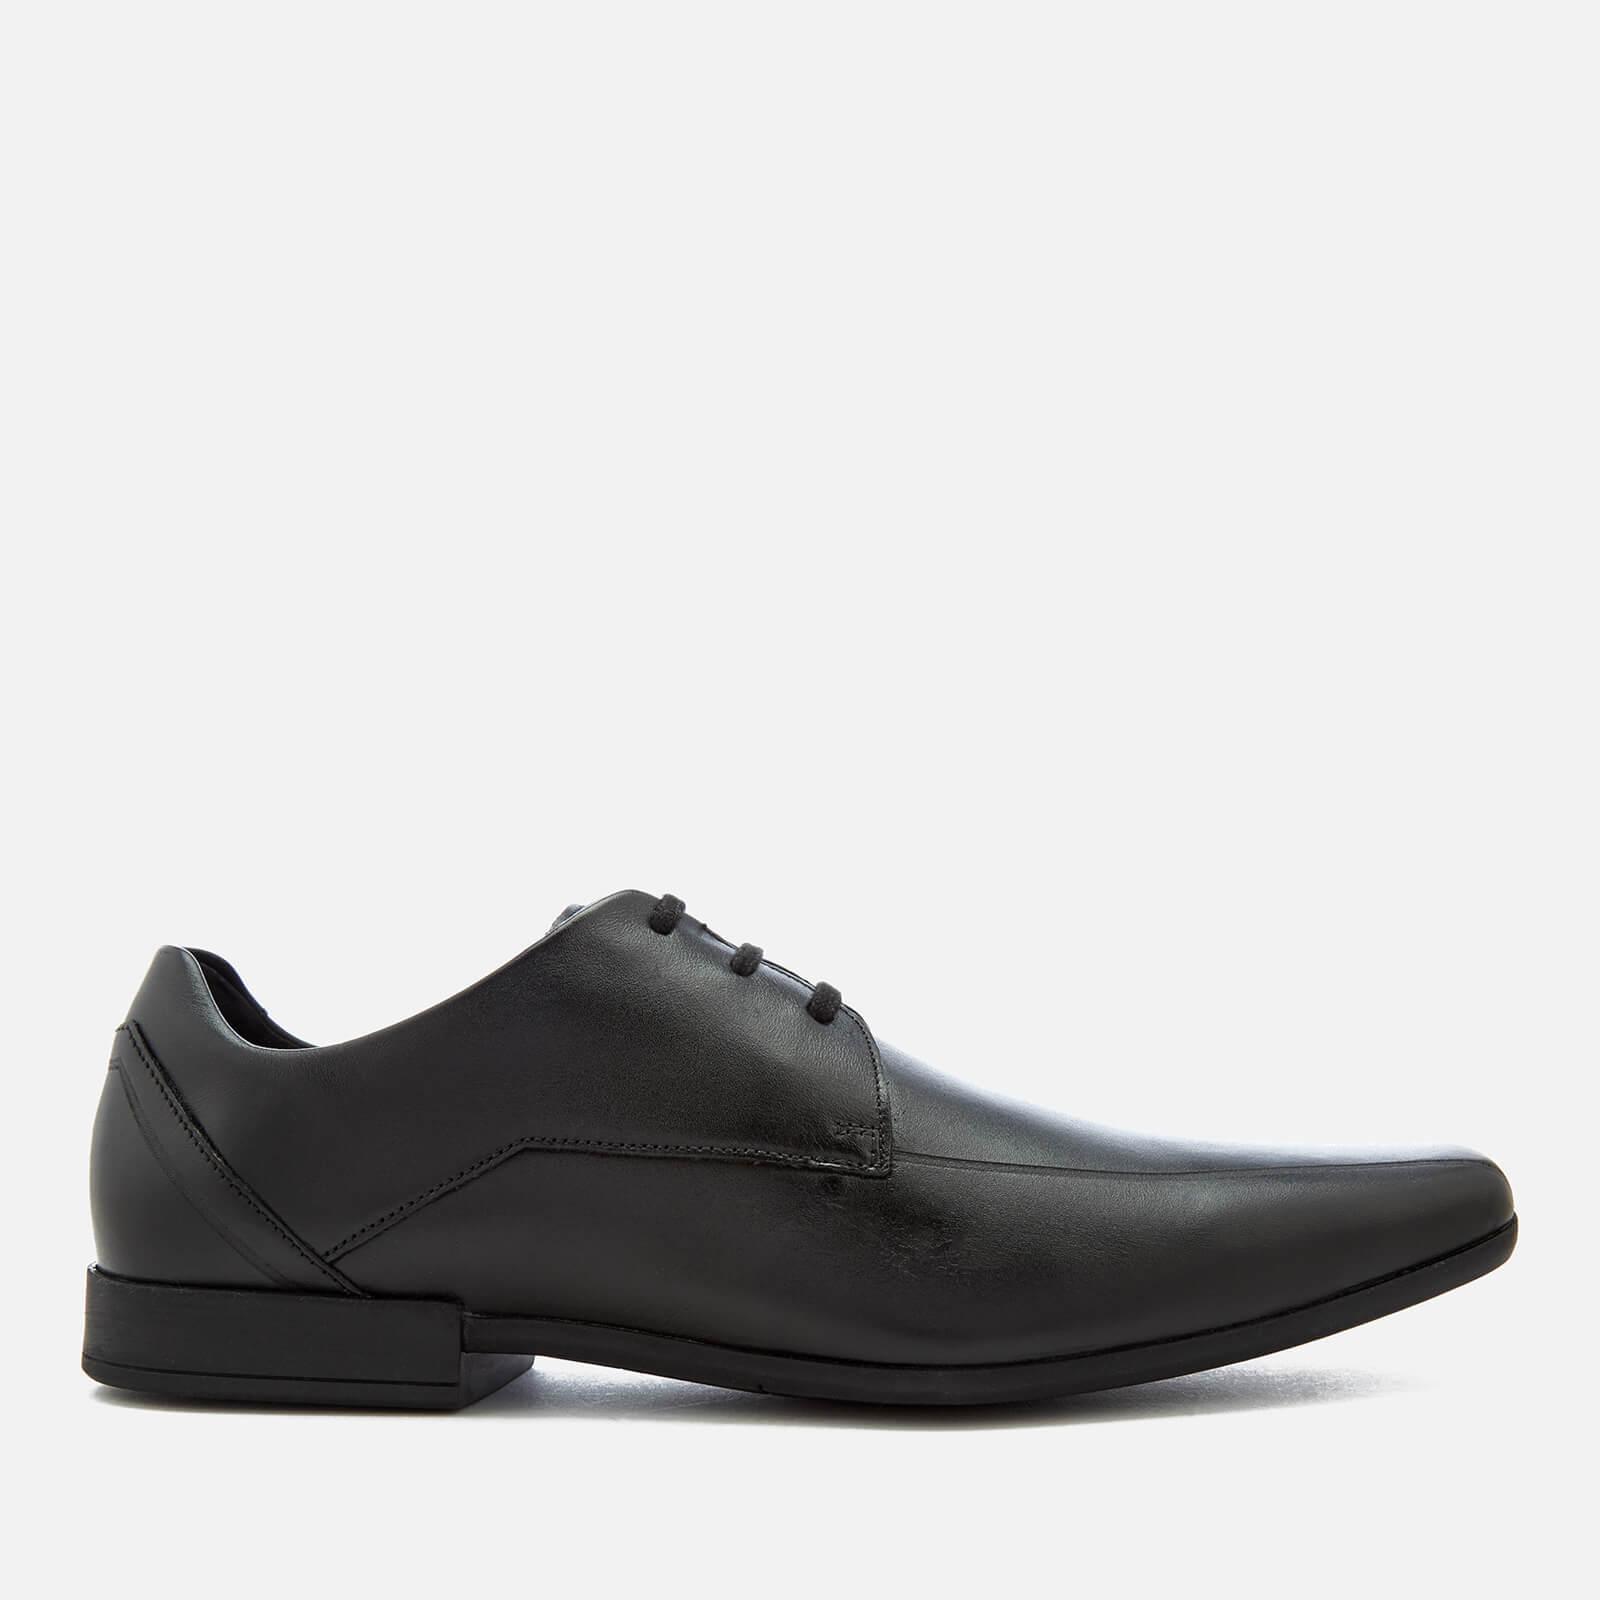 Clarks Men's Glement Over Leather Derby Shoes - Black - UK 8